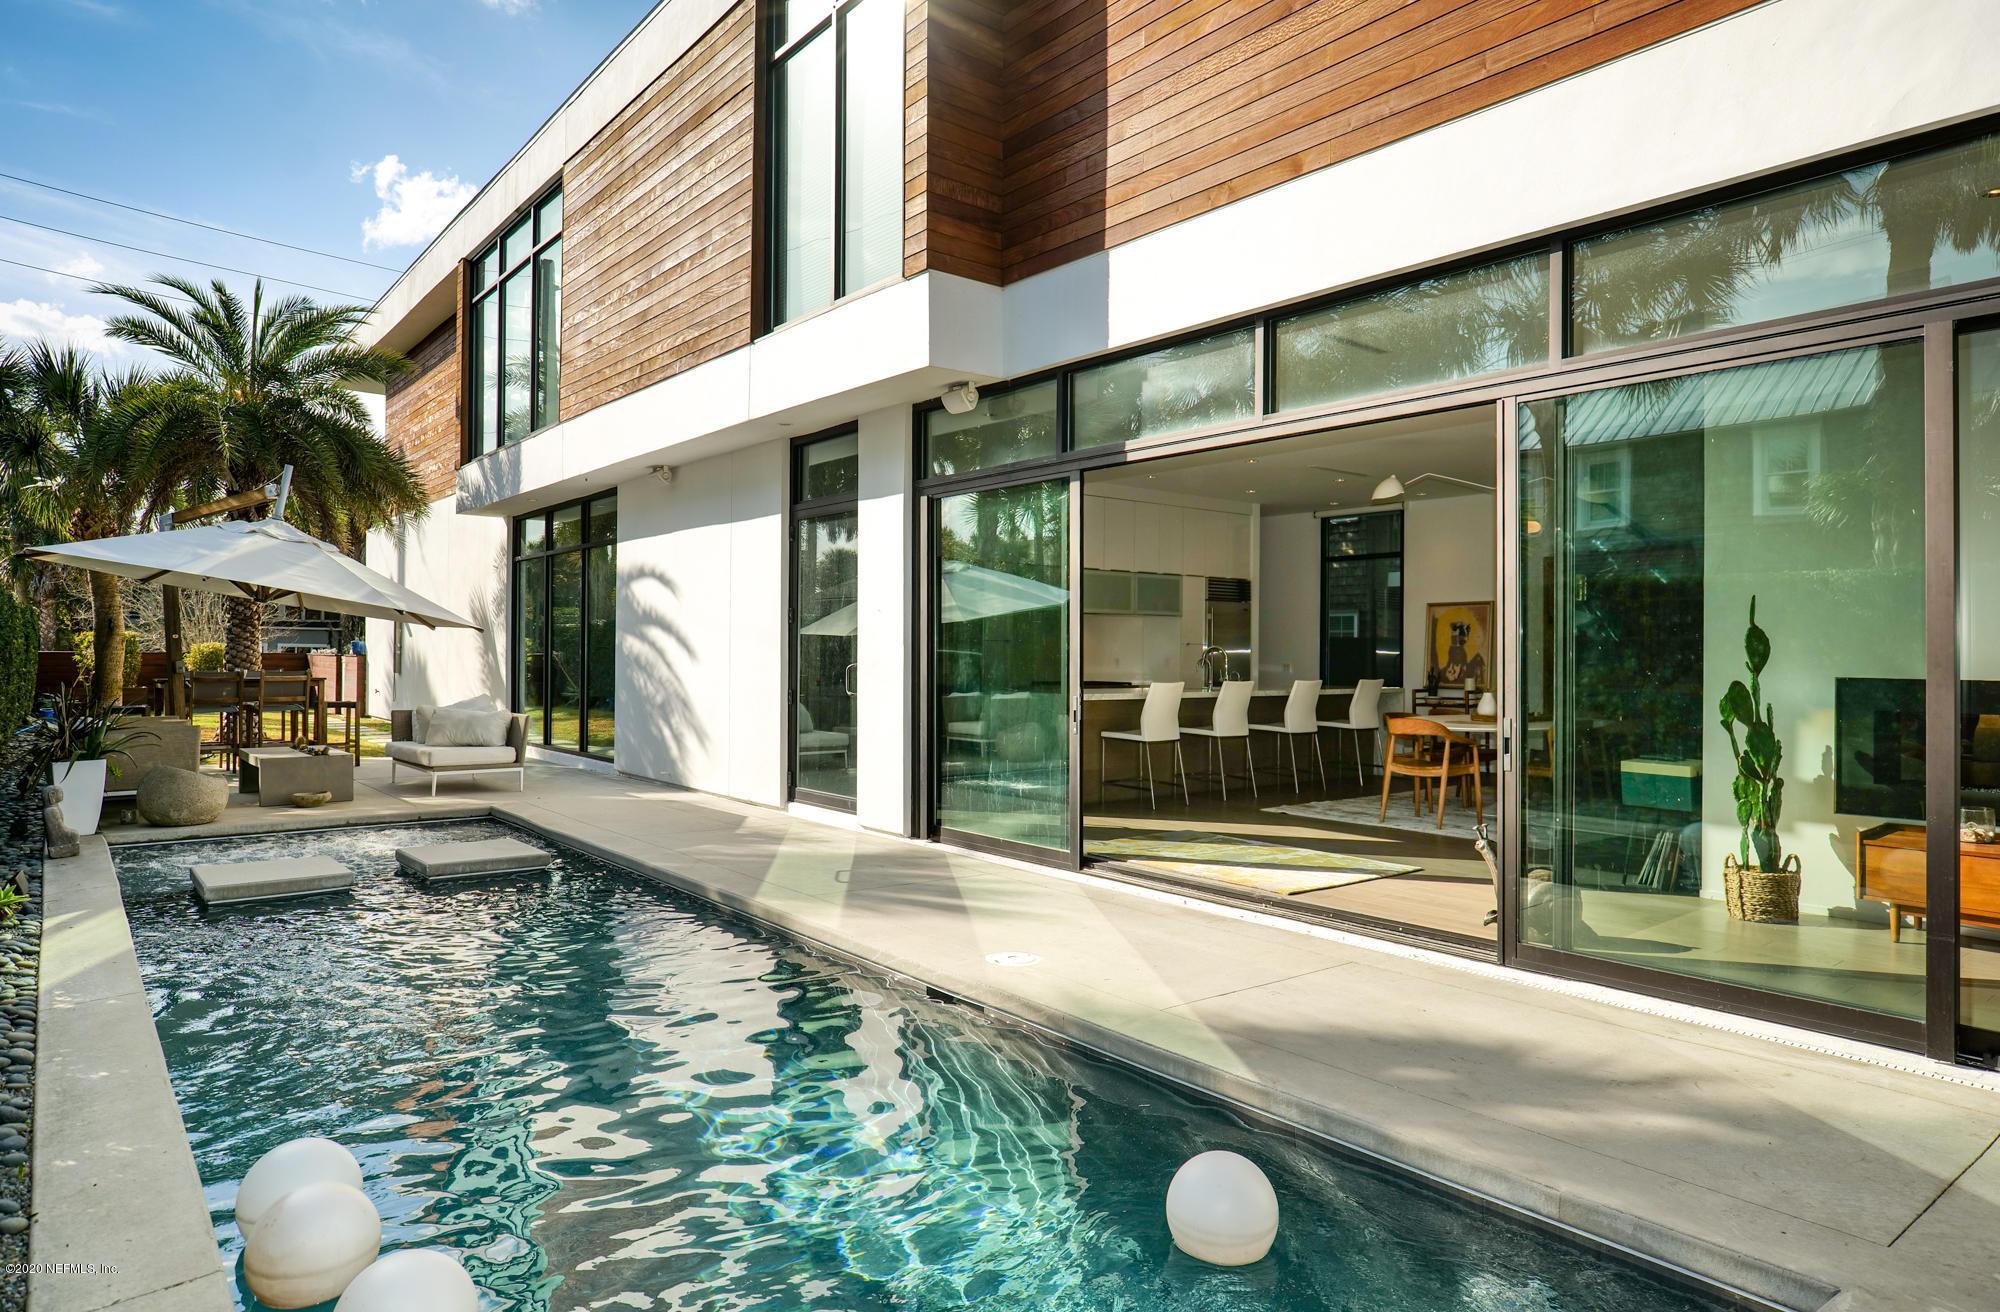 320 BEACH, ATLANTIC BEACH, FLORIDA 32233, 4 Bedrooms Bedrooms, ,4 BathroomsBathrooms,Residential,For sale,BEACH,1039593